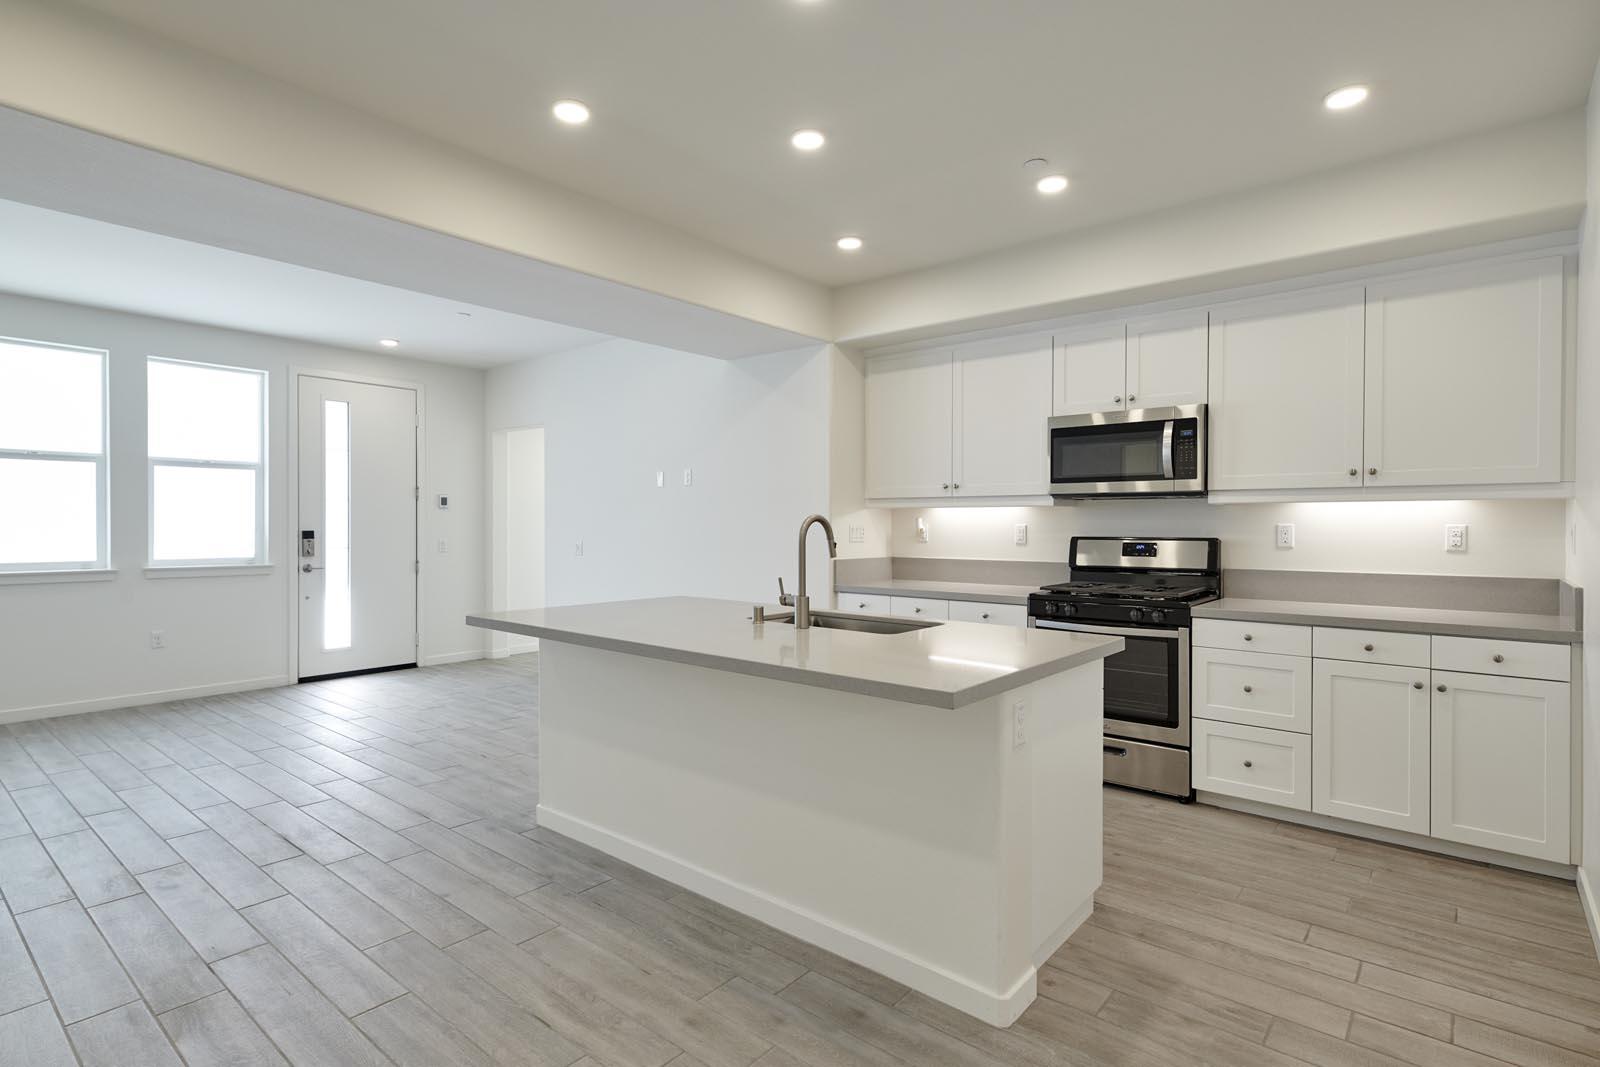 Kitchen | Residence 2 | Aspire | New Homes in Rancho Cucamonga, CA | Van Daele Homes